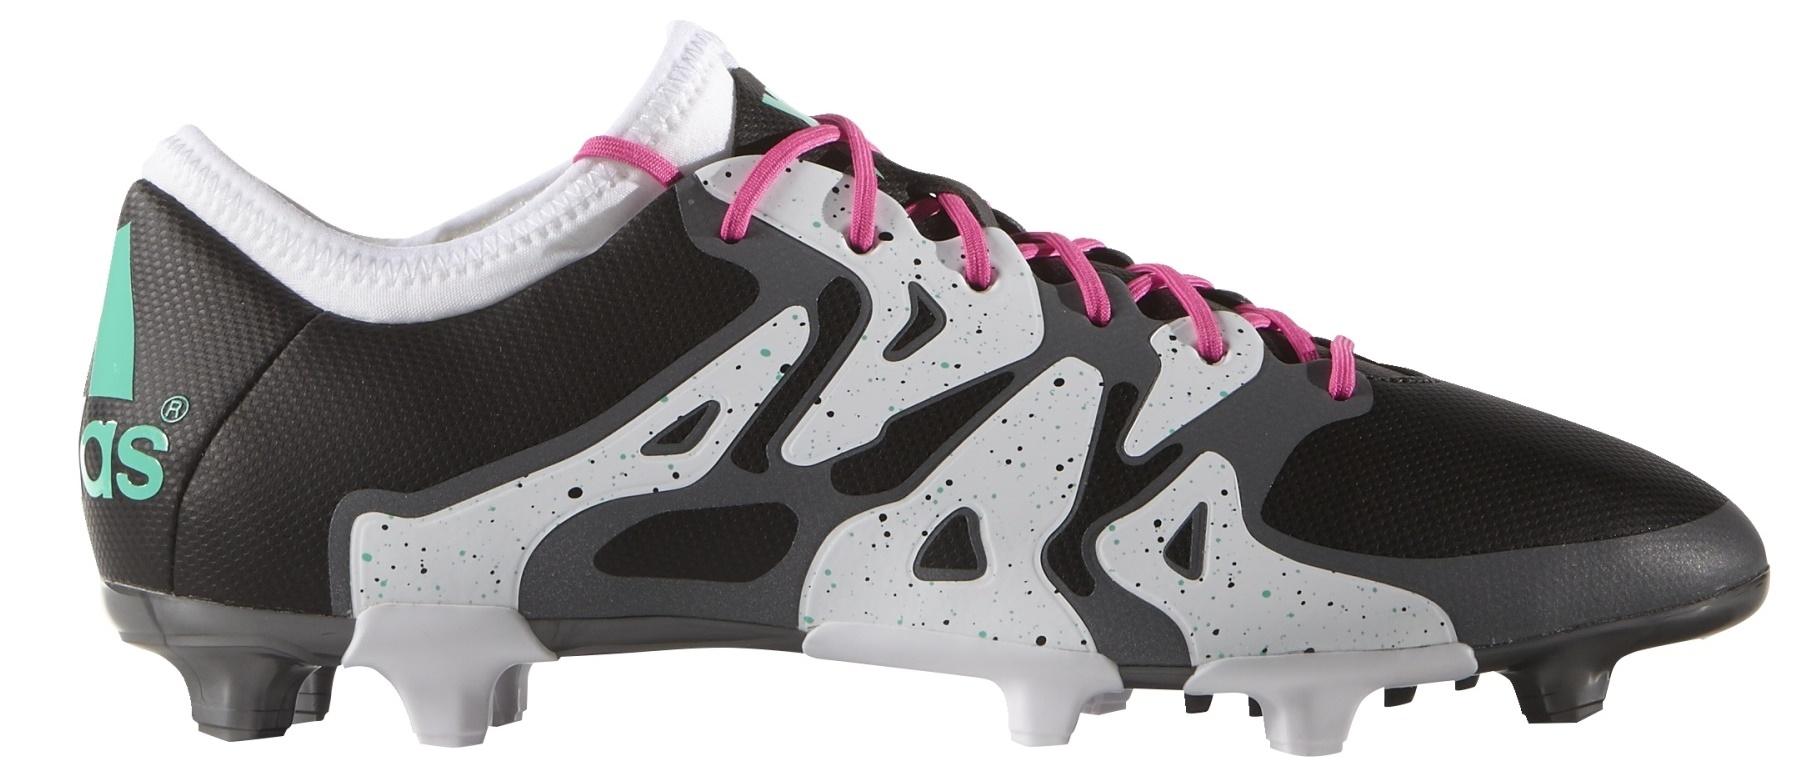 6e62ff0a3b545 Football Boots Adidas X15.2 FG AG colore White Black - Adidas - SportIT.com